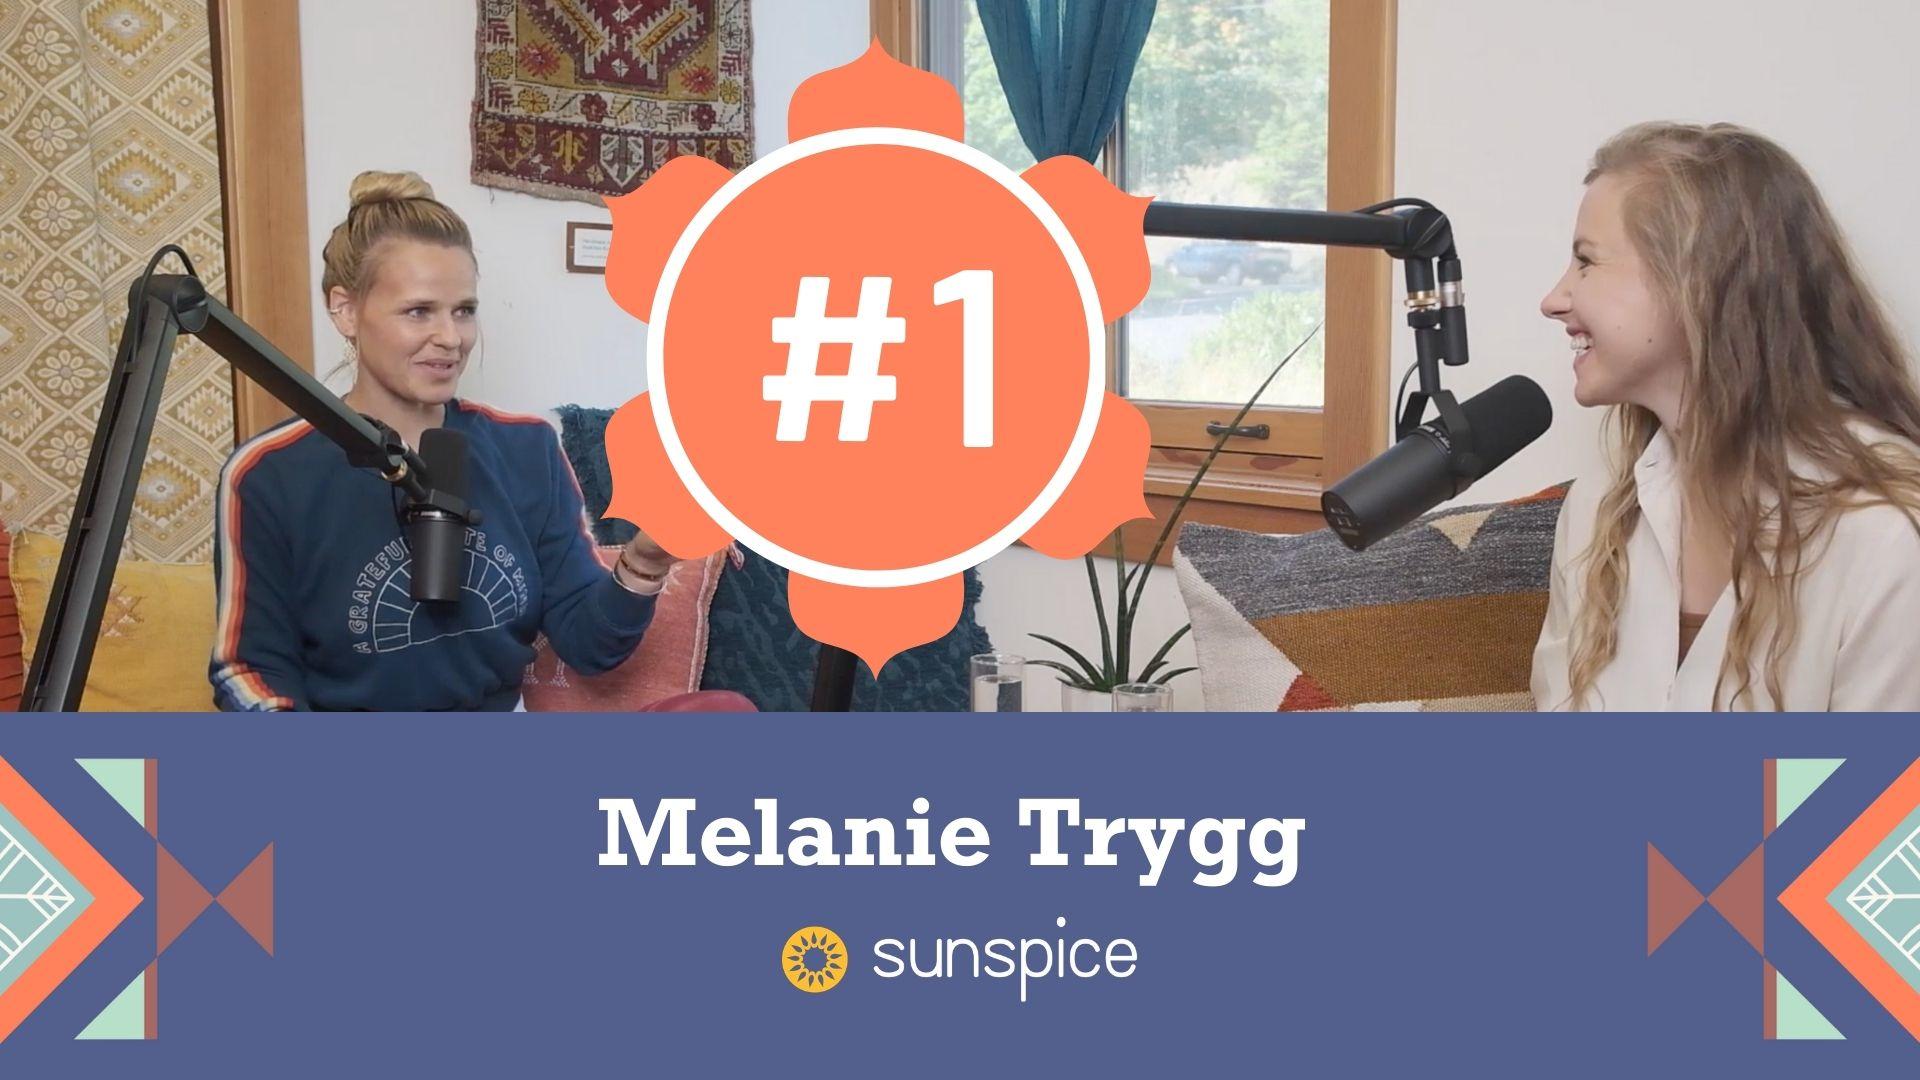 #1 Melanie Trygg: Runway Fashion Designer Turned Yogi